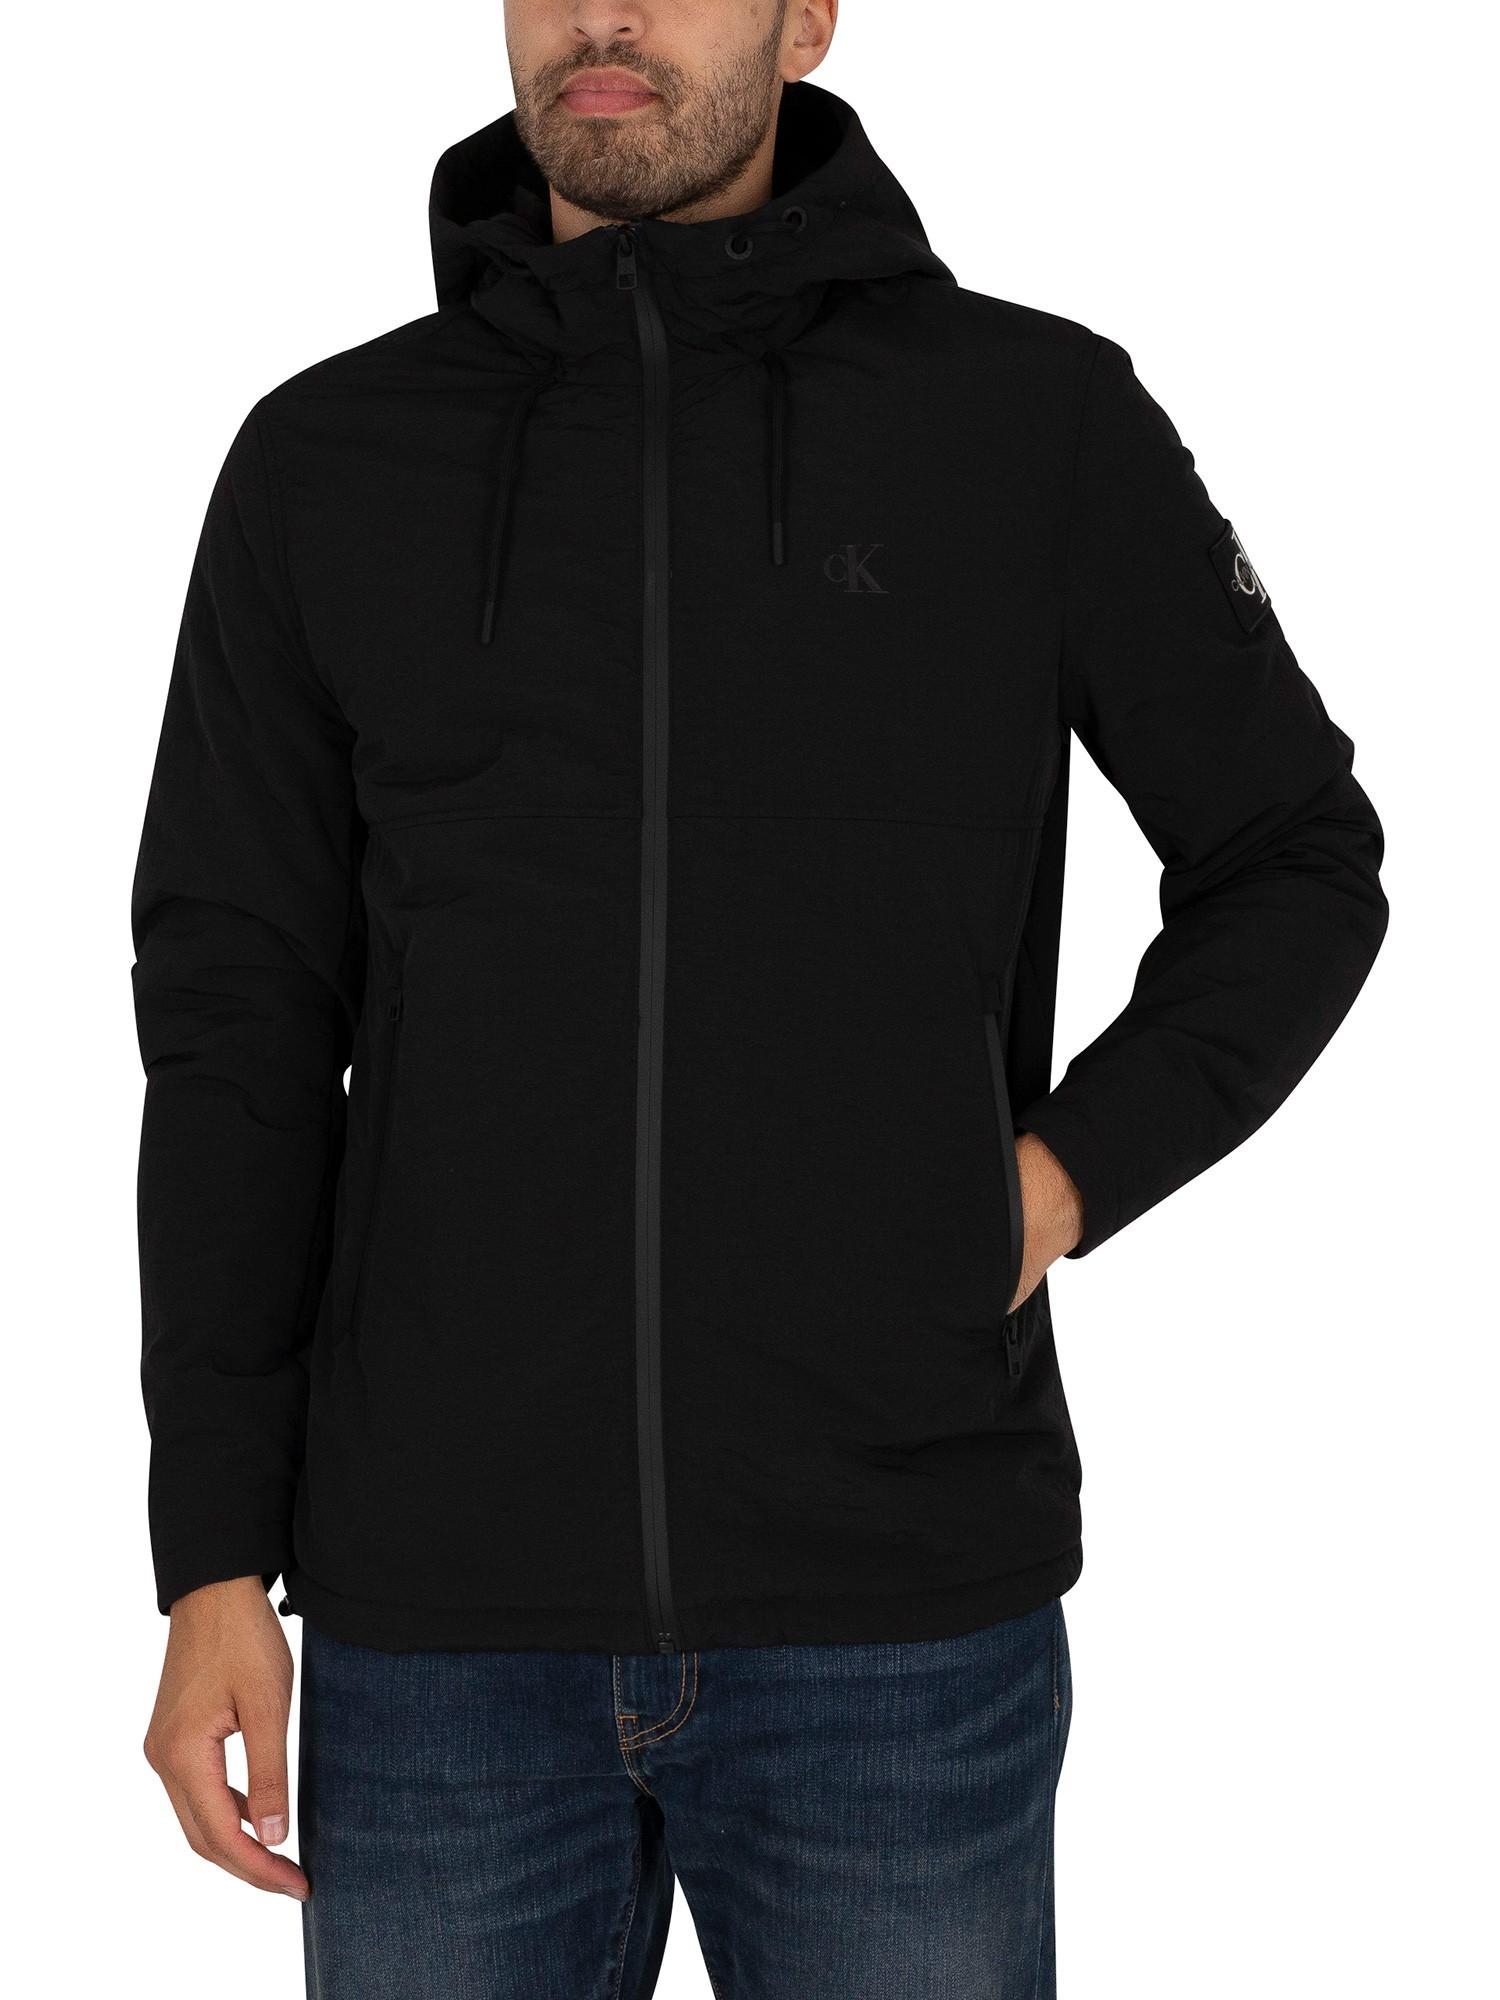 New-Harrington-Jacket